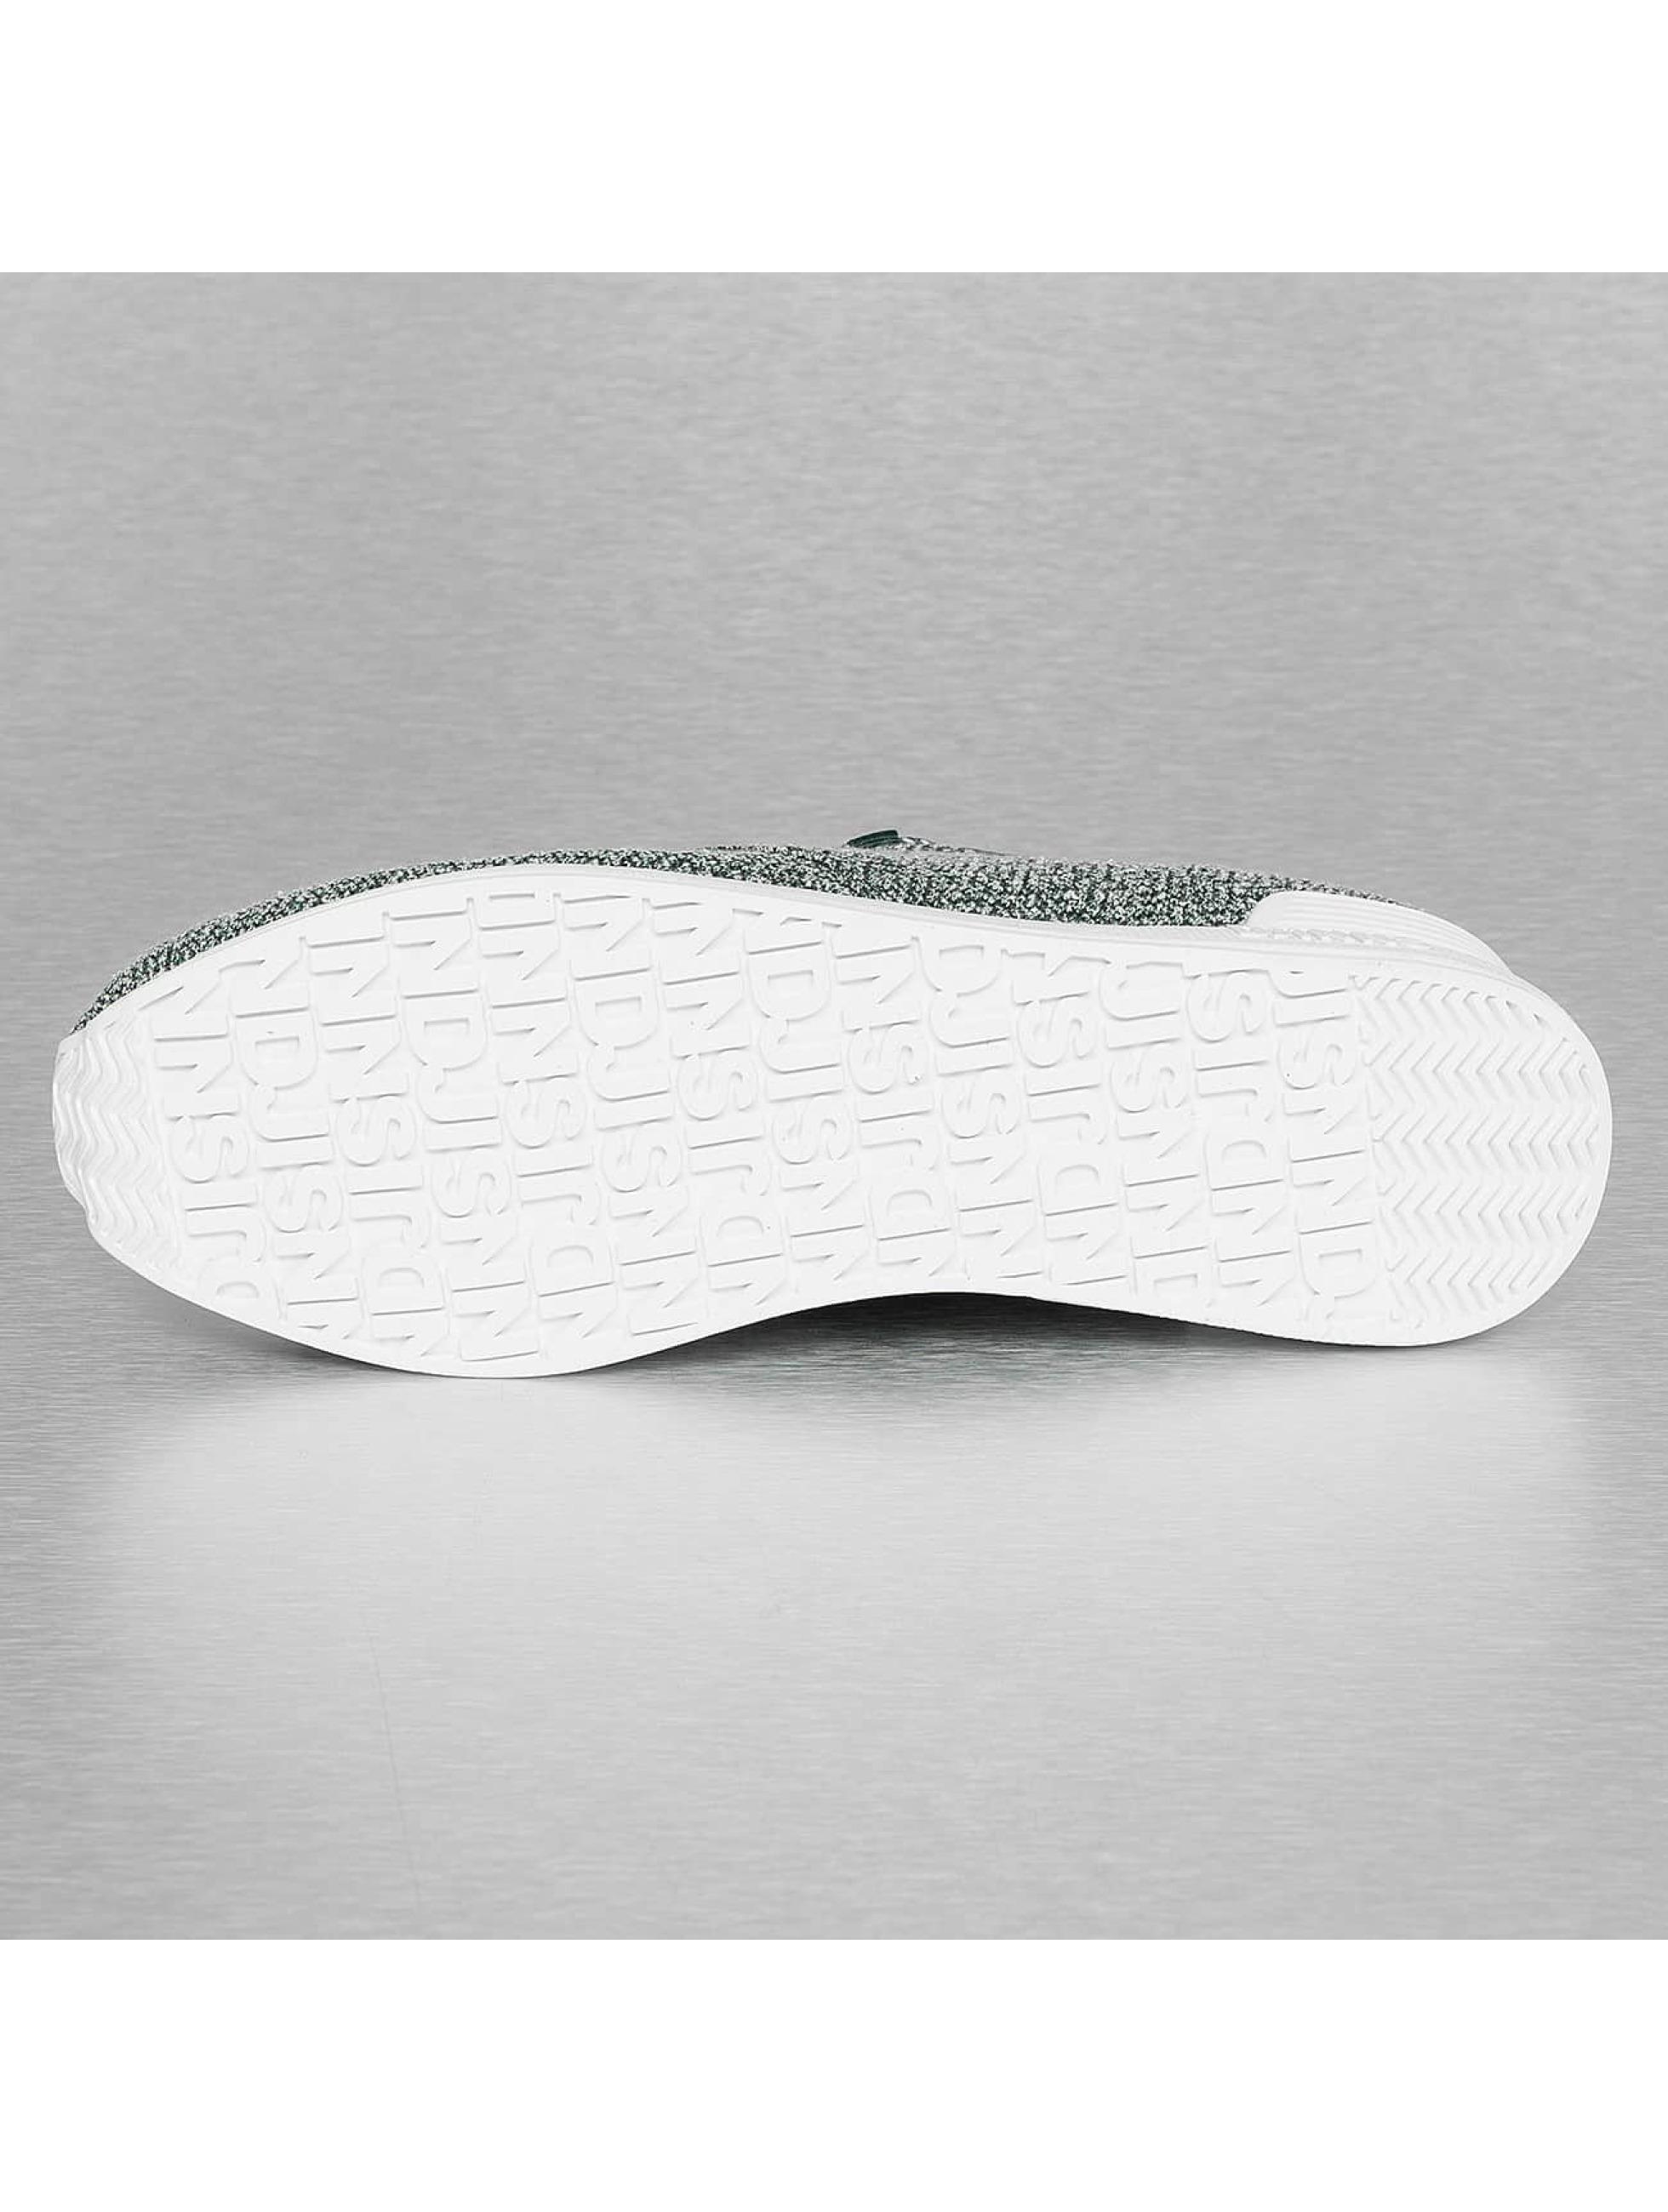 Djinns Sneakers Moc Lau Squeeze IV zelená